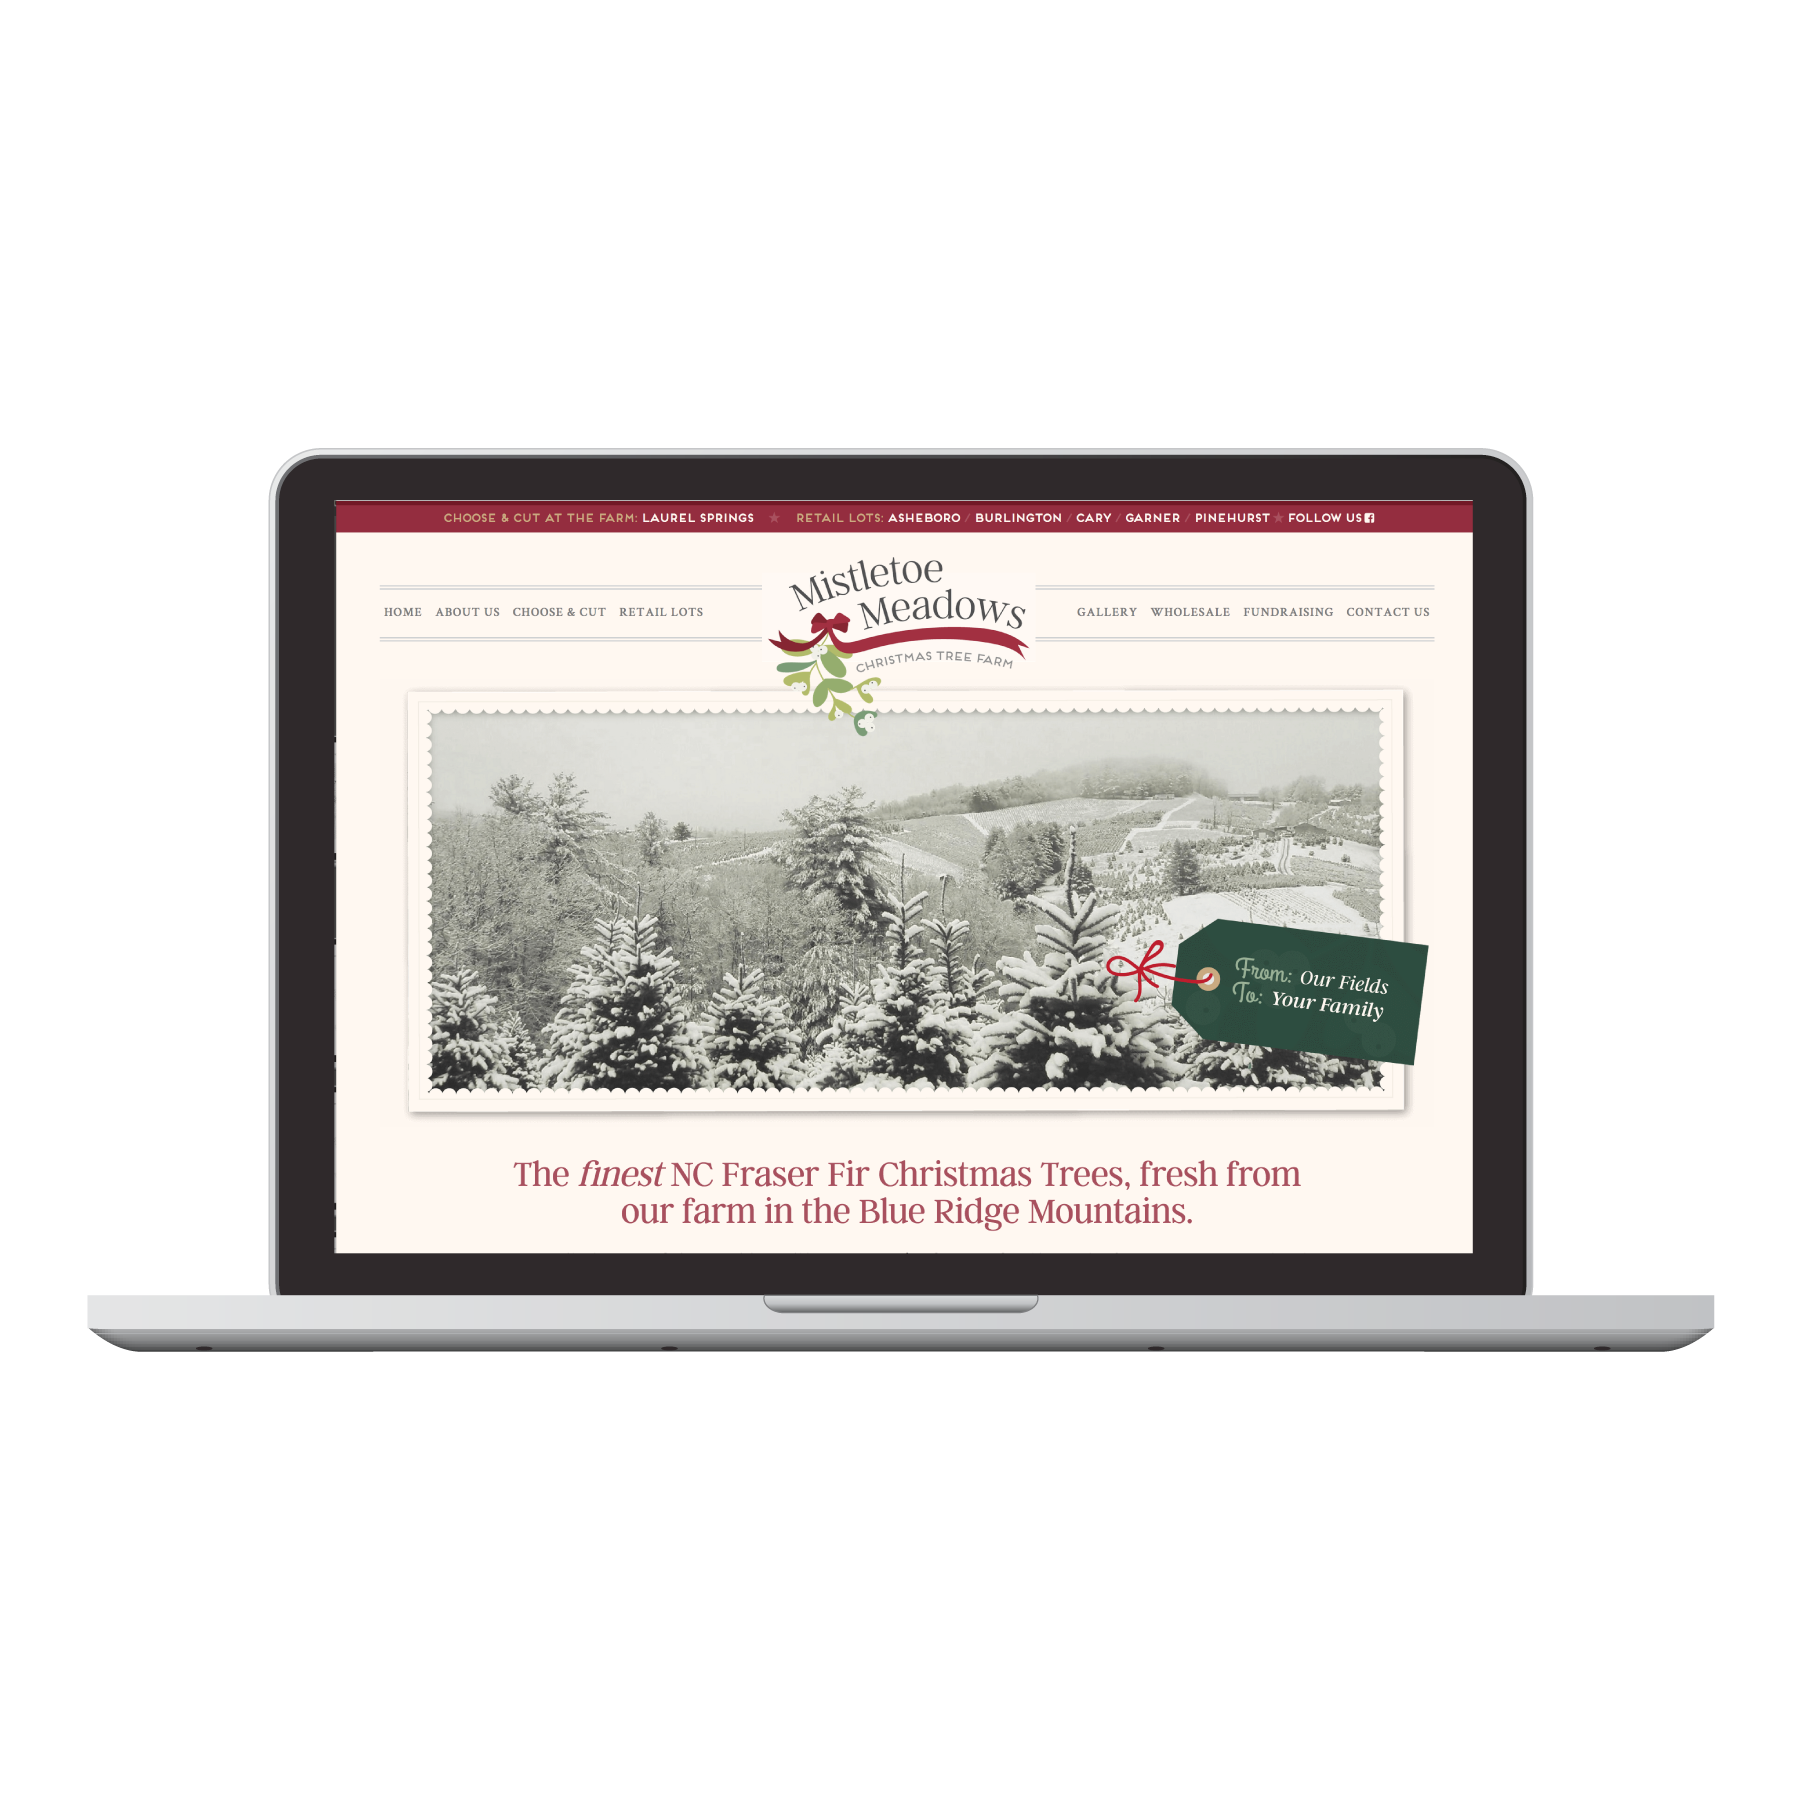 Mistletoe Meadows